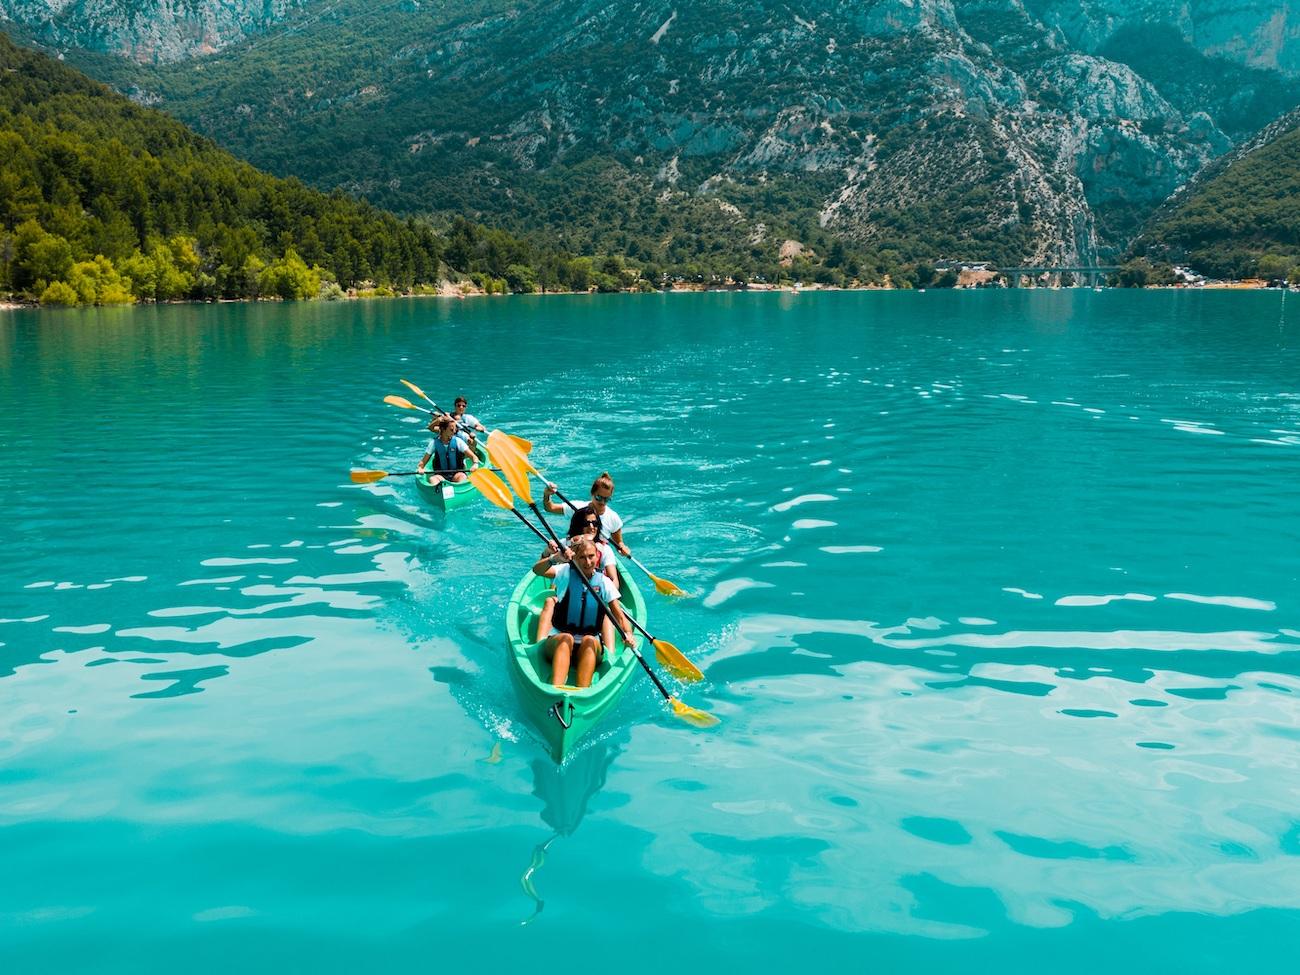 CAMPING CADENIERES_canoe-lac-sainte-croix